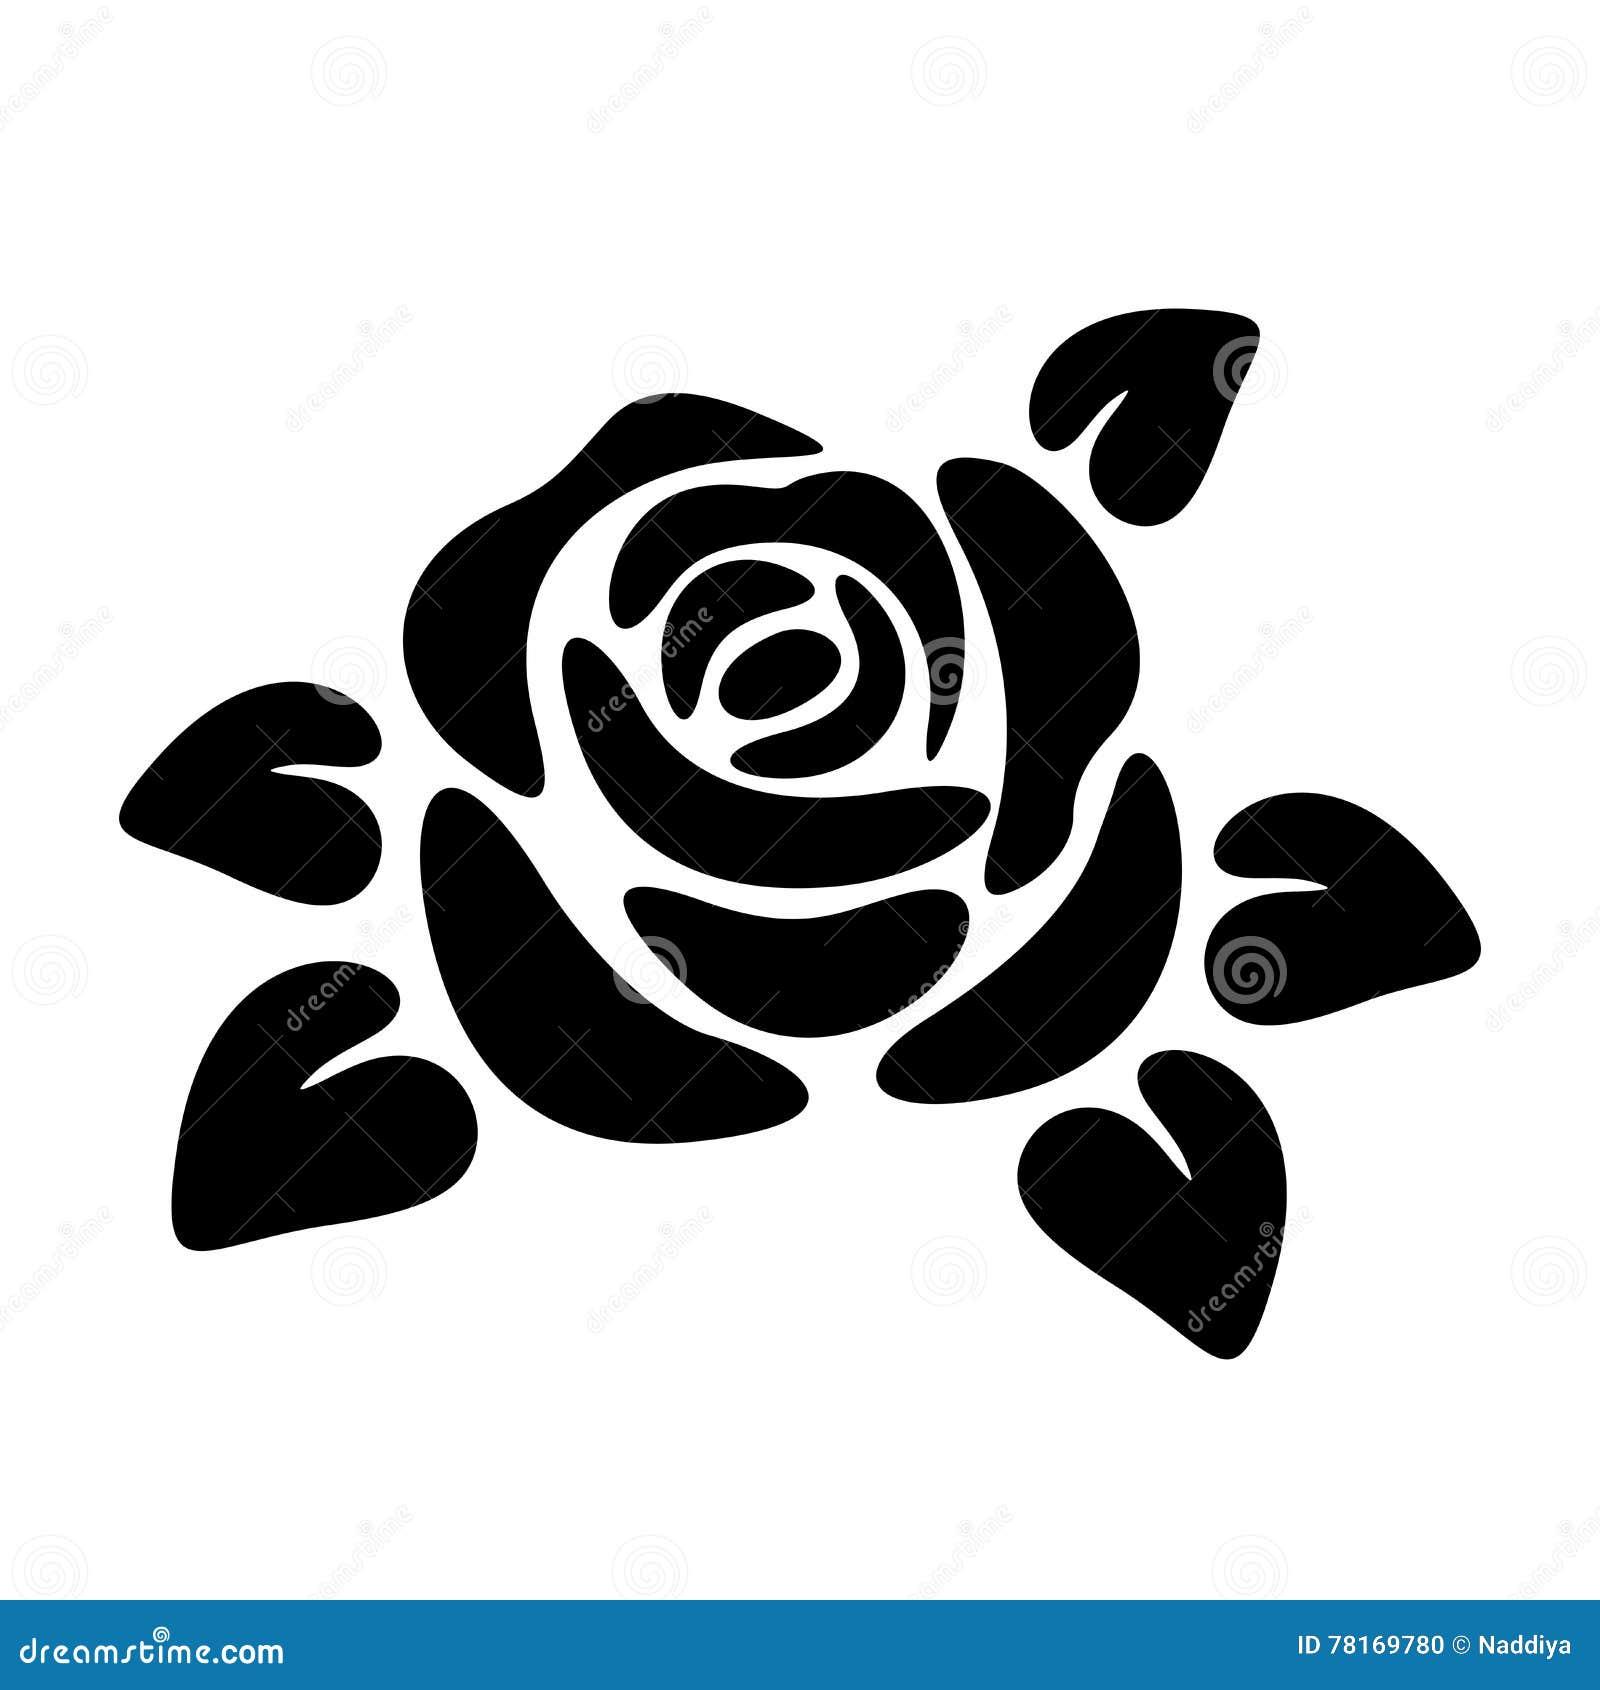 Rose vector illustrations stock vector illustration of jilani black silhouette of a rose vector illustrations stock photo voltagebd Choice Image